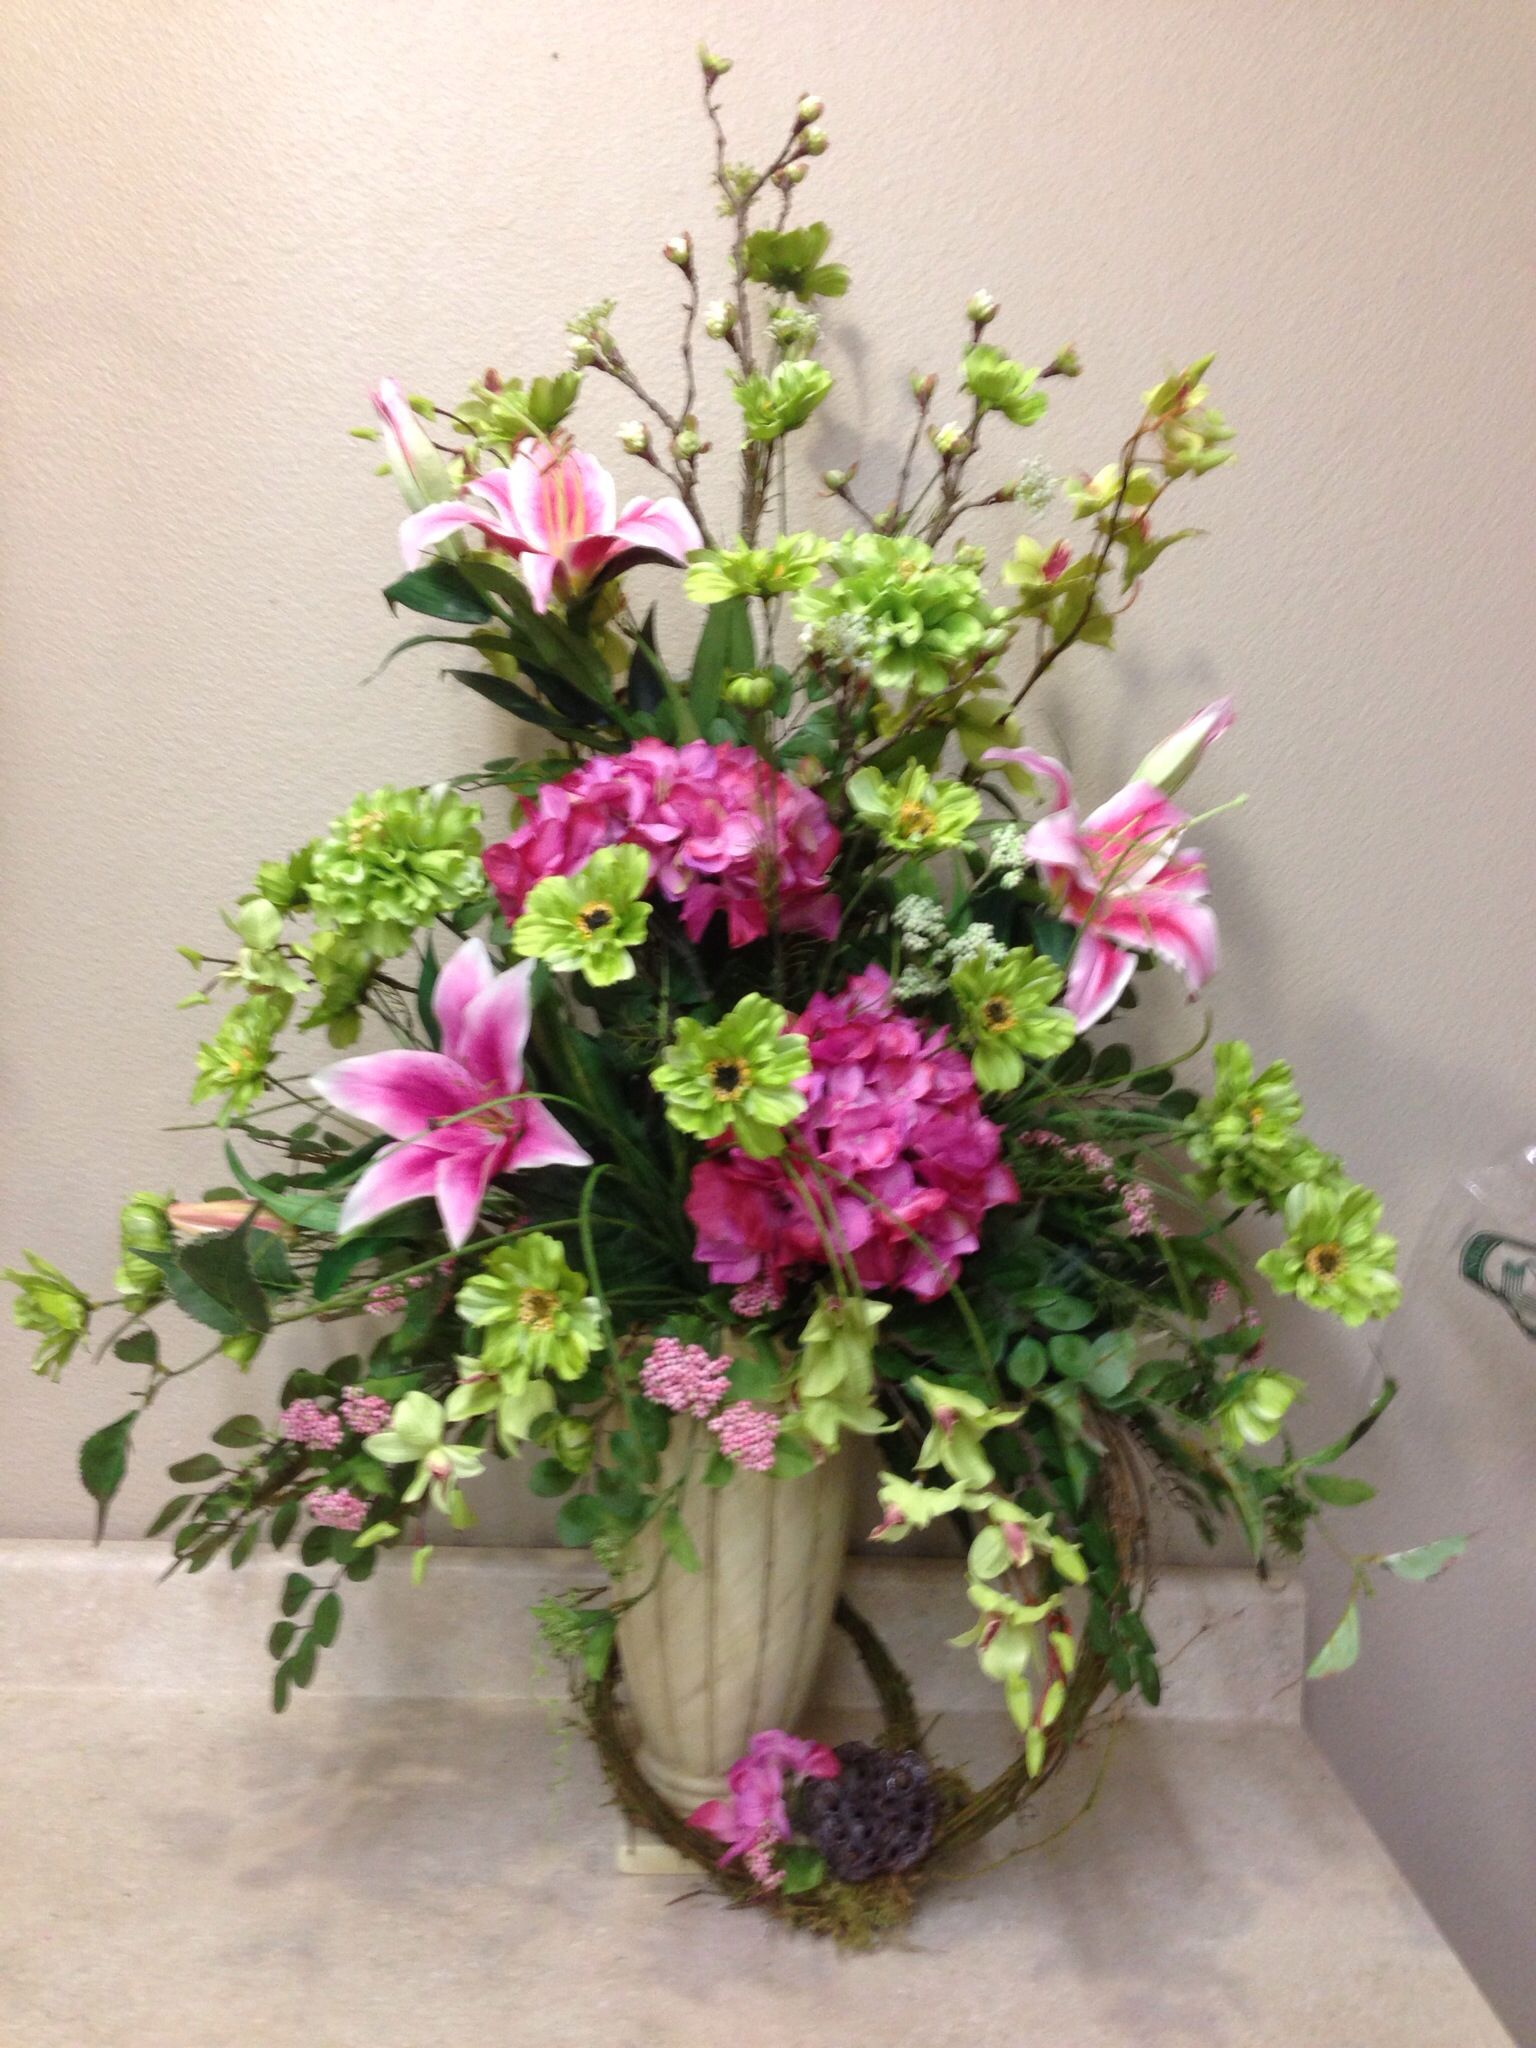 A pretty lush flower arrangement in a rustic wooden ... |Large Spring Floral Arrangements